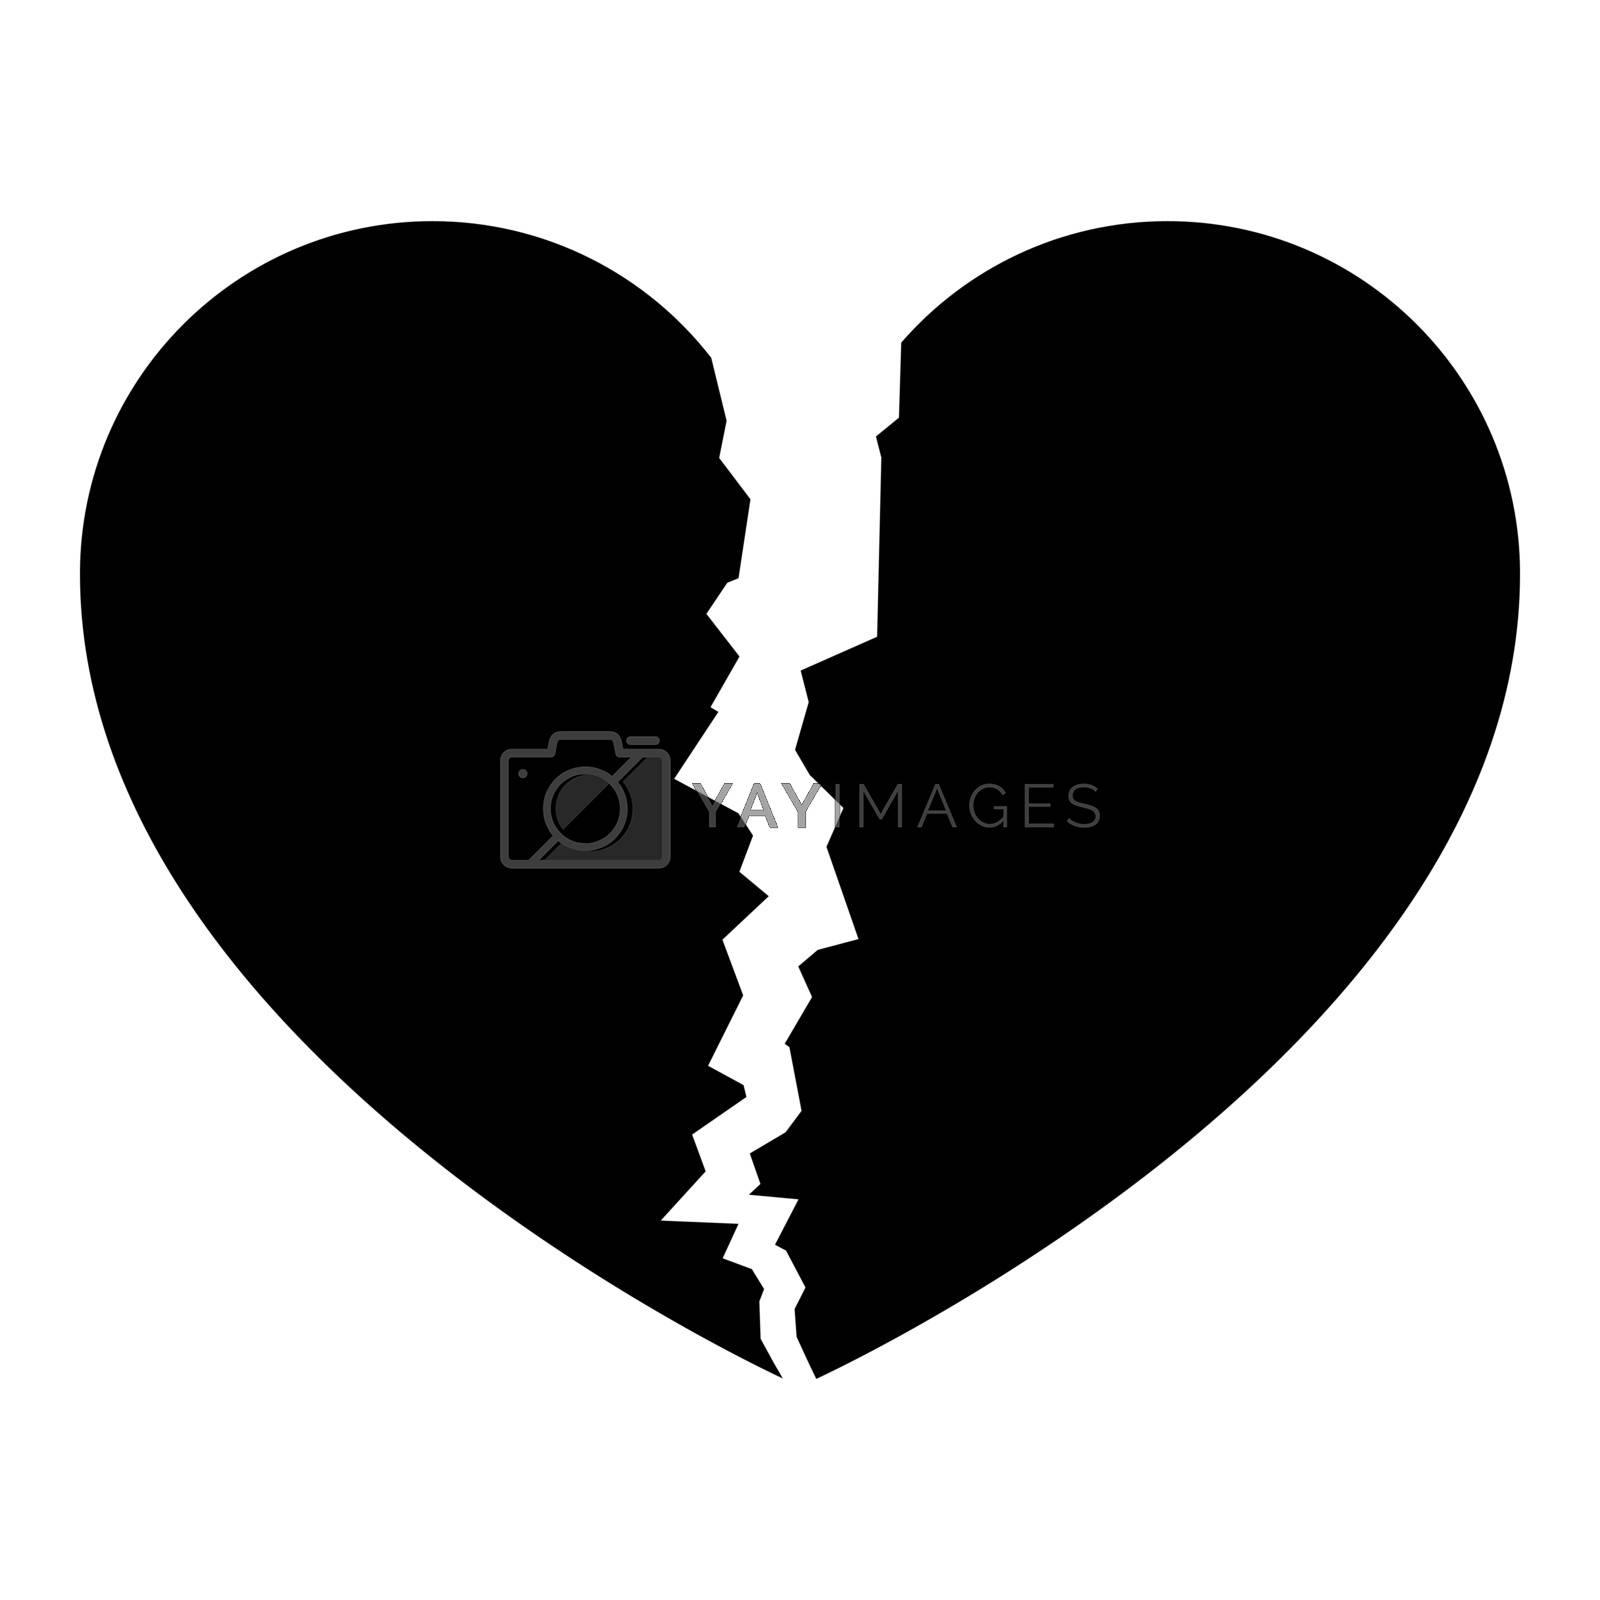 Broken heart icon black color vector illustration flat style simple image